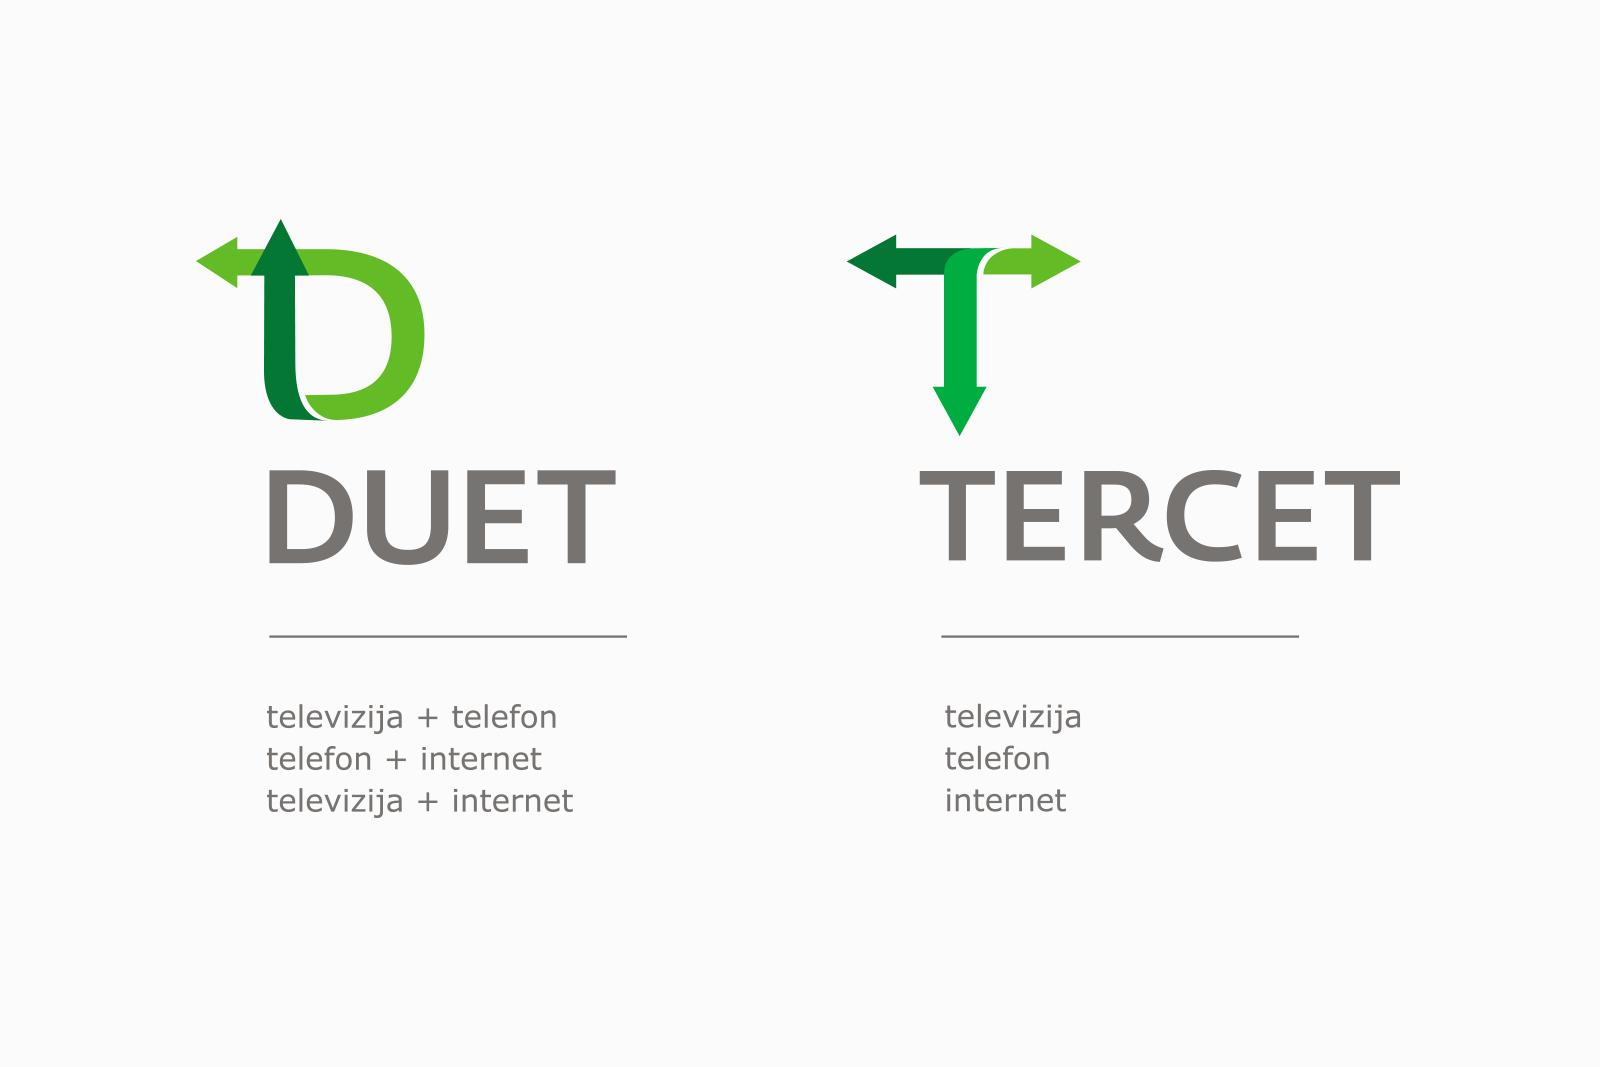 terrakom_duet_tercet_logo_identity.png